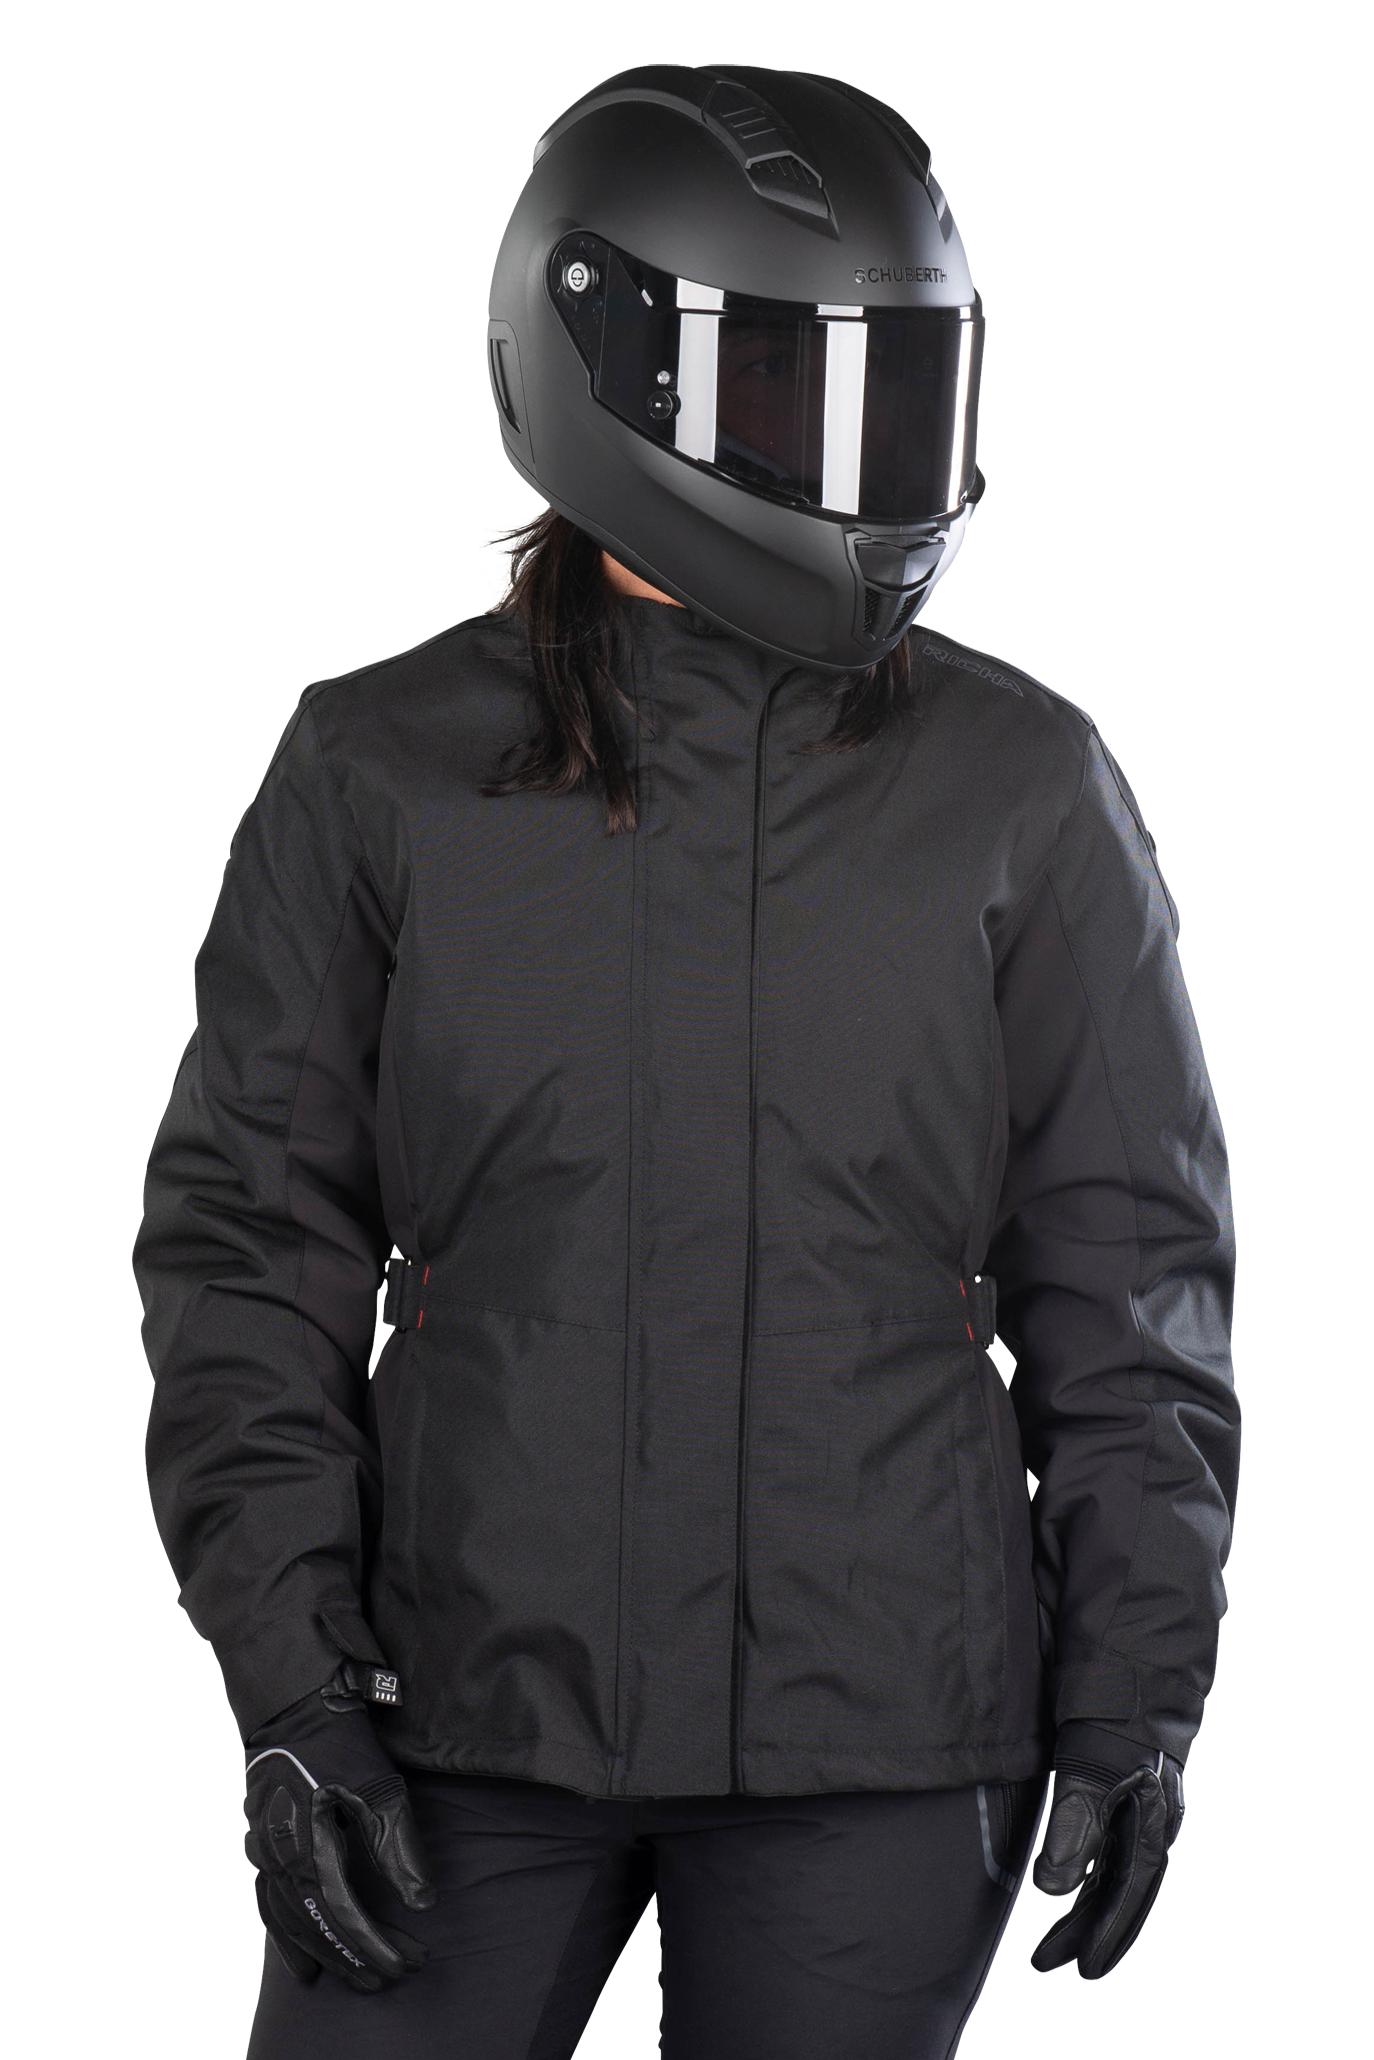 richa giacca moto donna  queen 2 nera